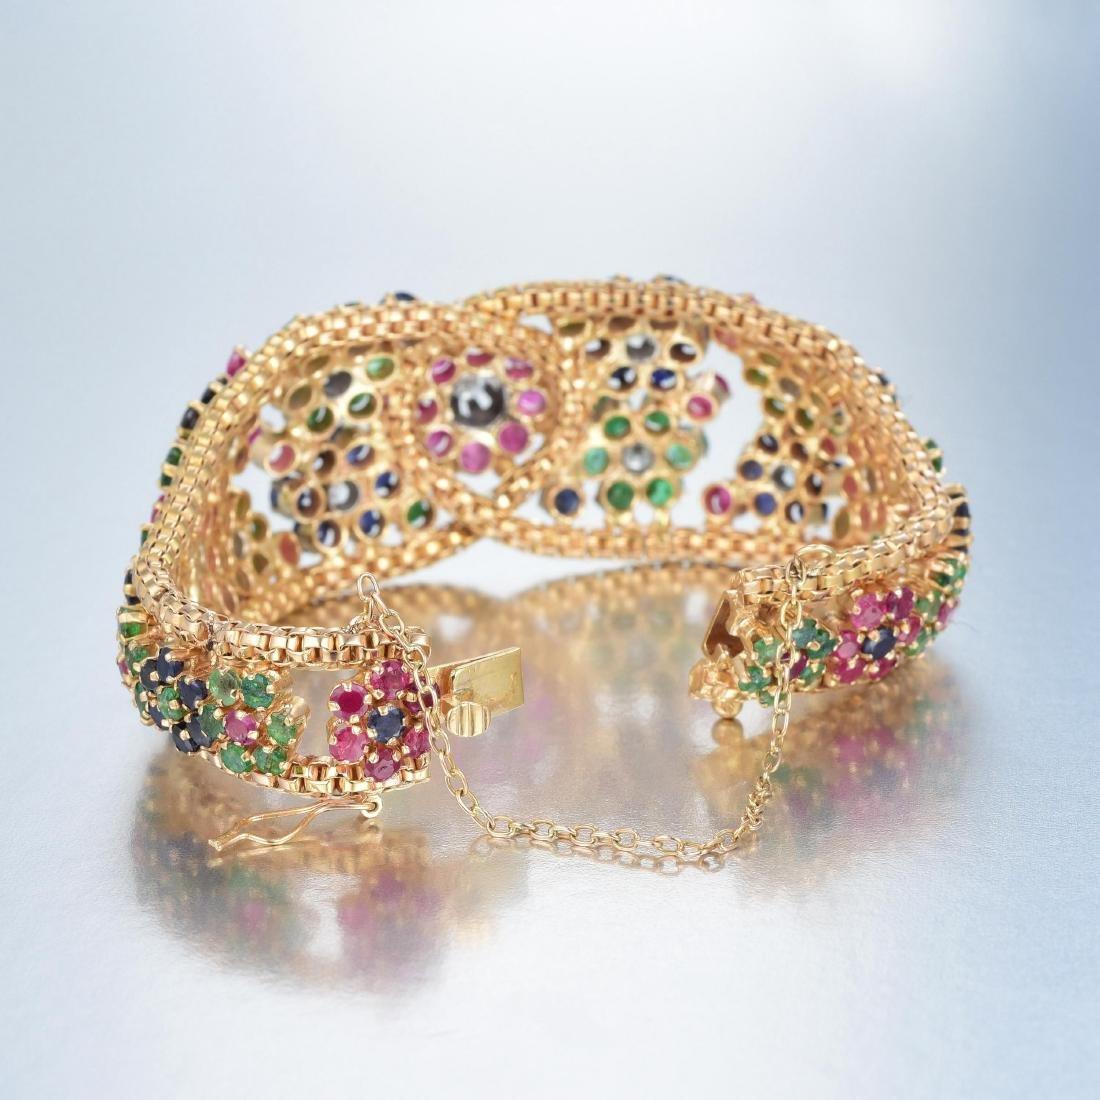 A 14K Gold Diamond, Ruby, Emerald and Sapphire Bracelet - 3